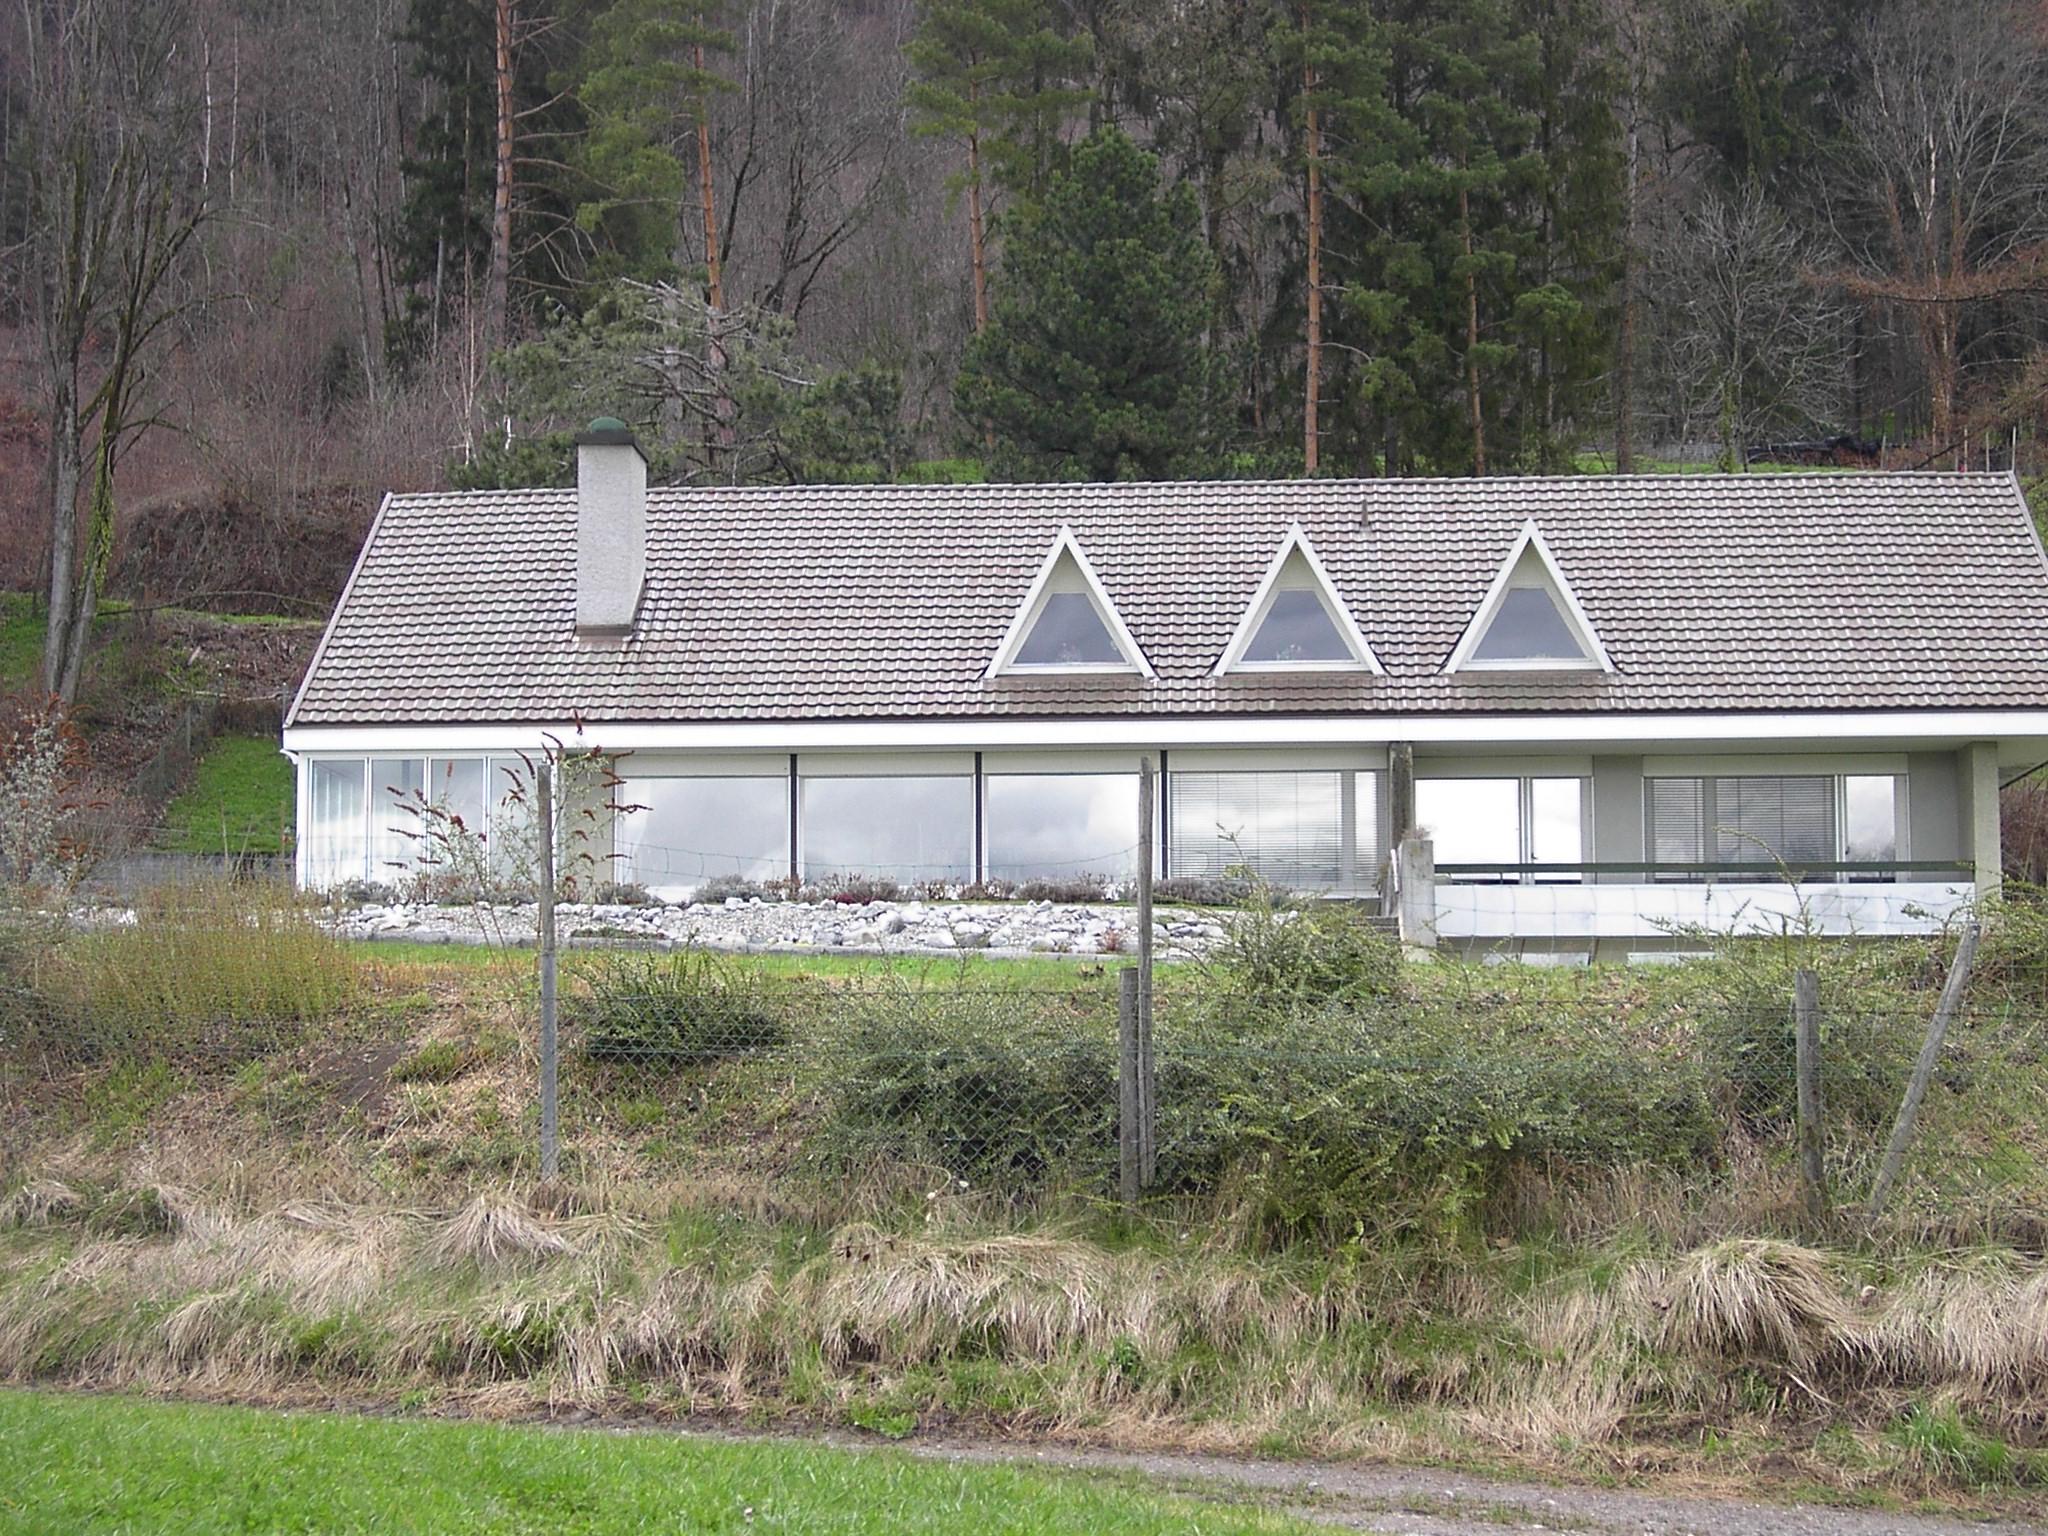 File:Modernes Haus aus den 60gern - panoramio.jpg - Wikimedia Commons